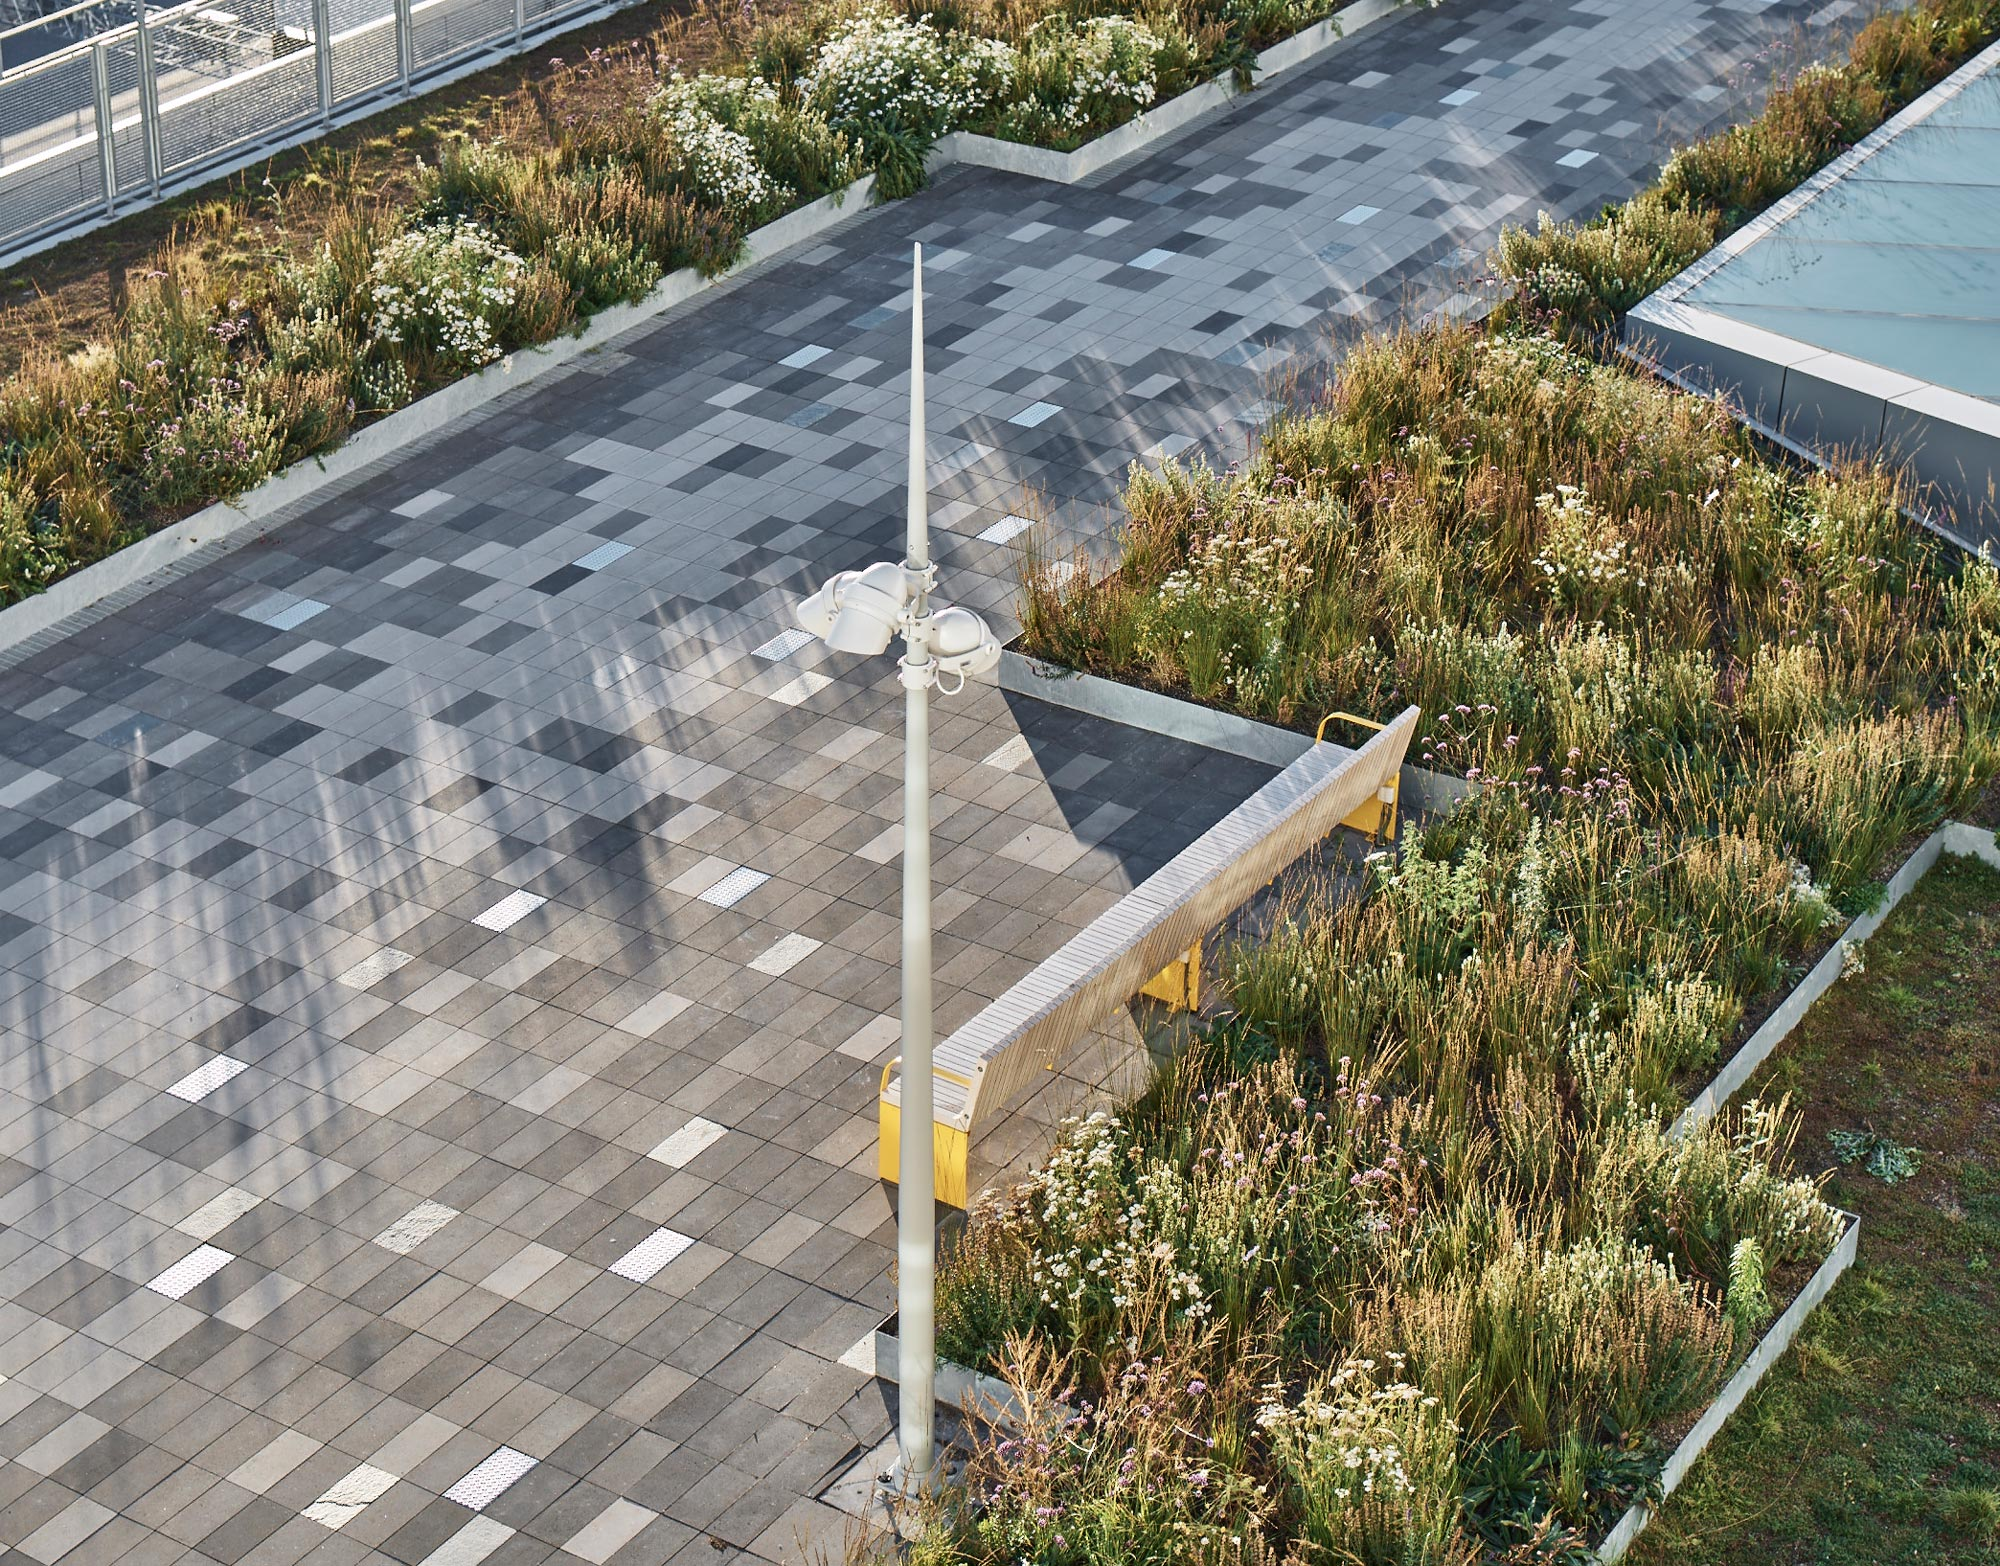 Plans Design Stockholm Roof Garden Ferry Terminal 09 171 Landscape